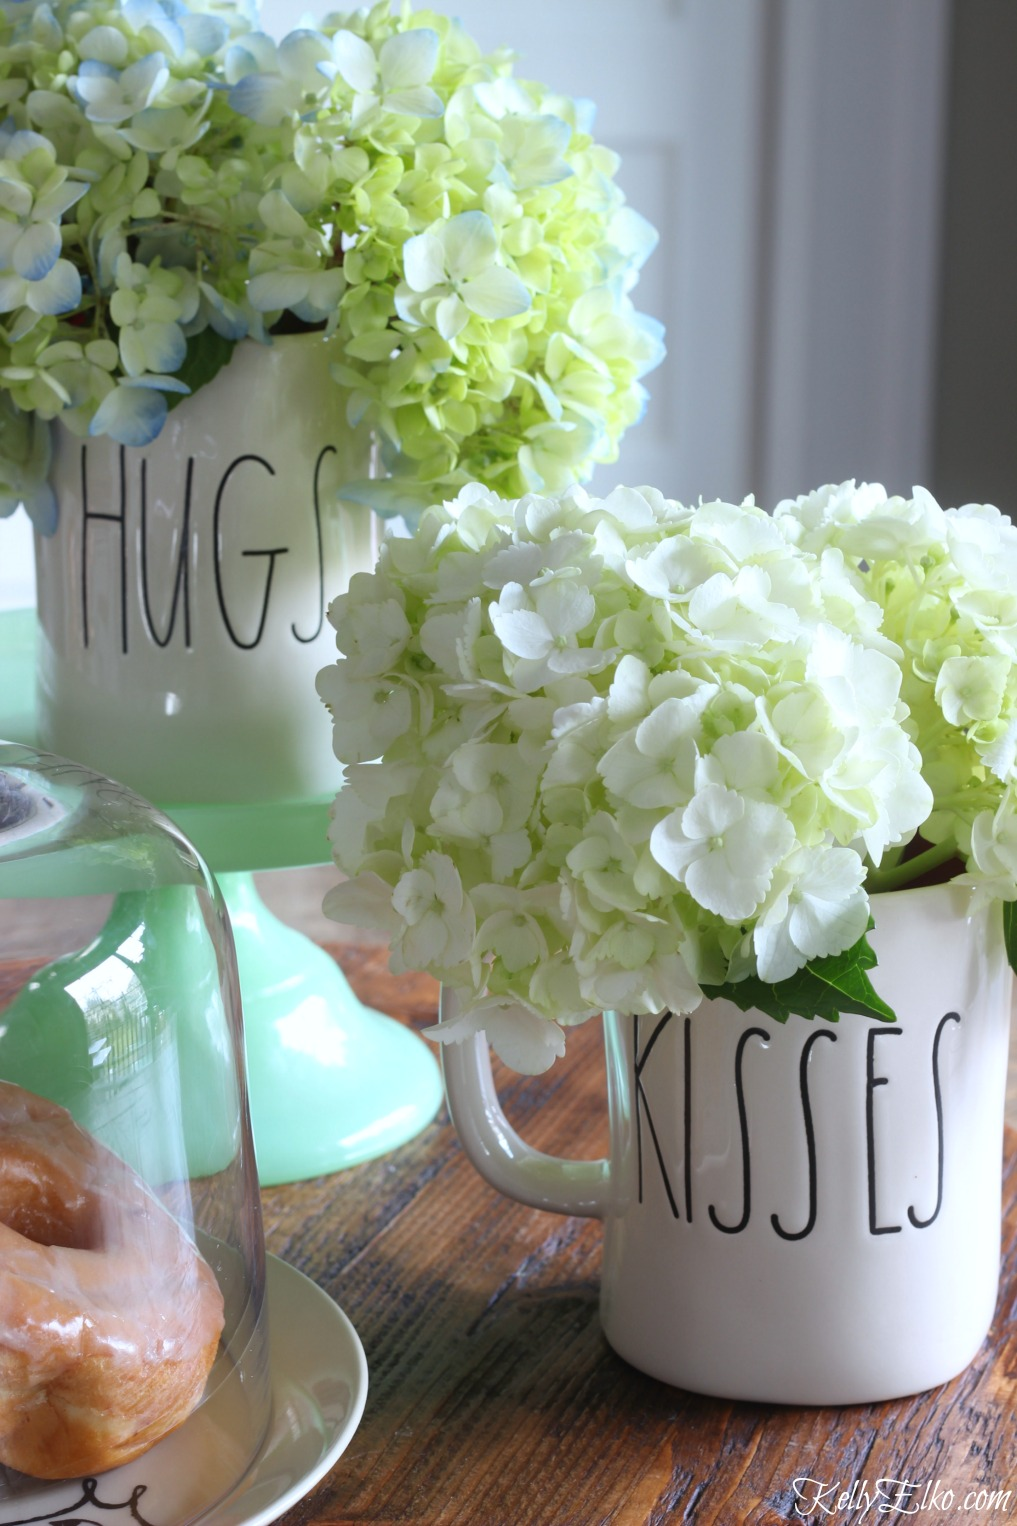 Valentine hydrangea centerpiece in fun Rae Dunn mugs kellyelko.com